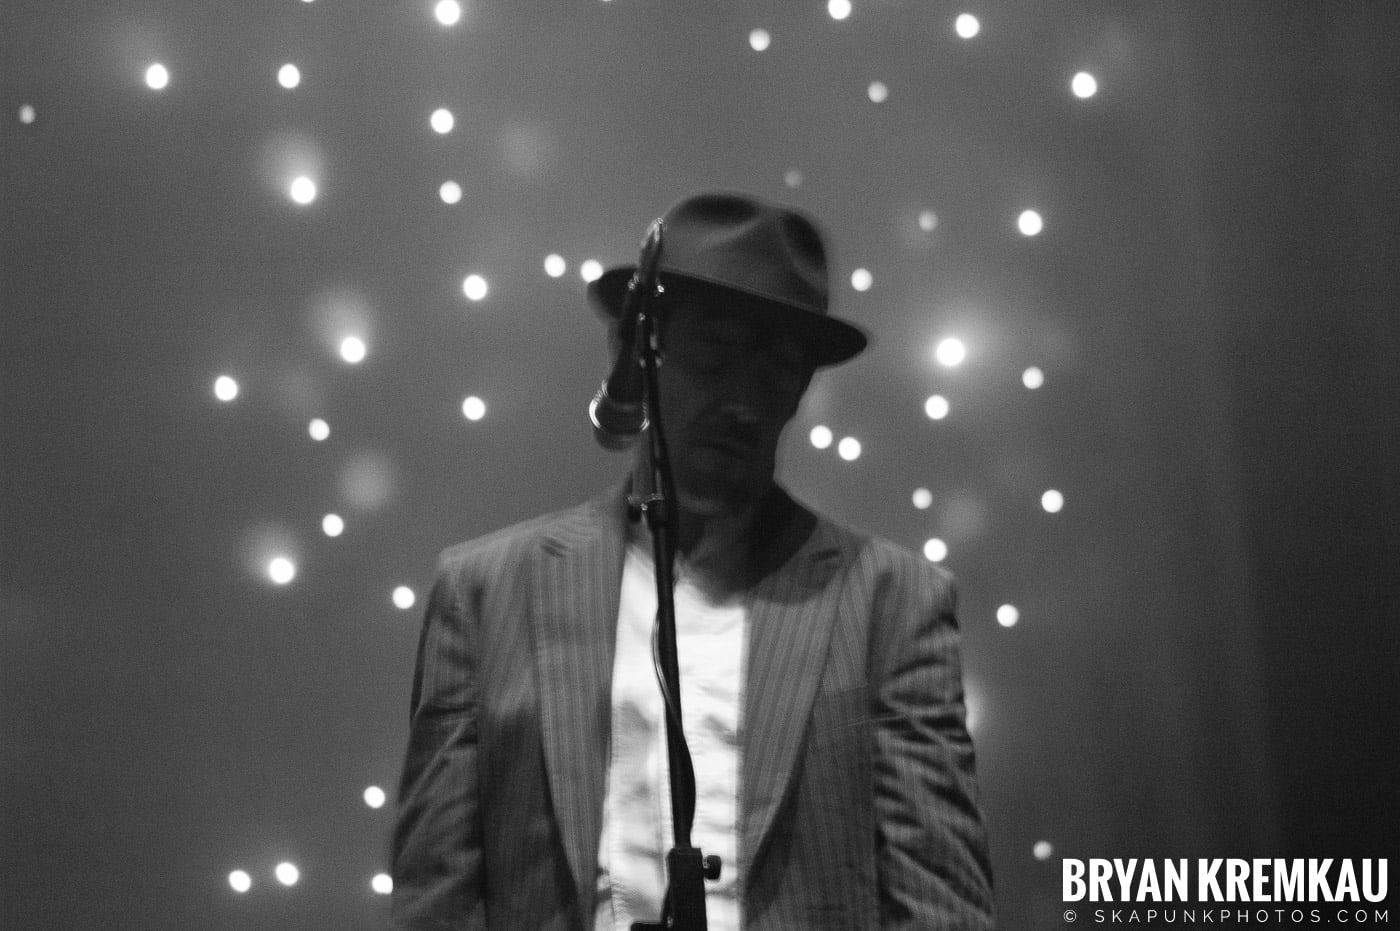 The Pogues @ Brixton Academy, London UK - 12.17.06 (12)